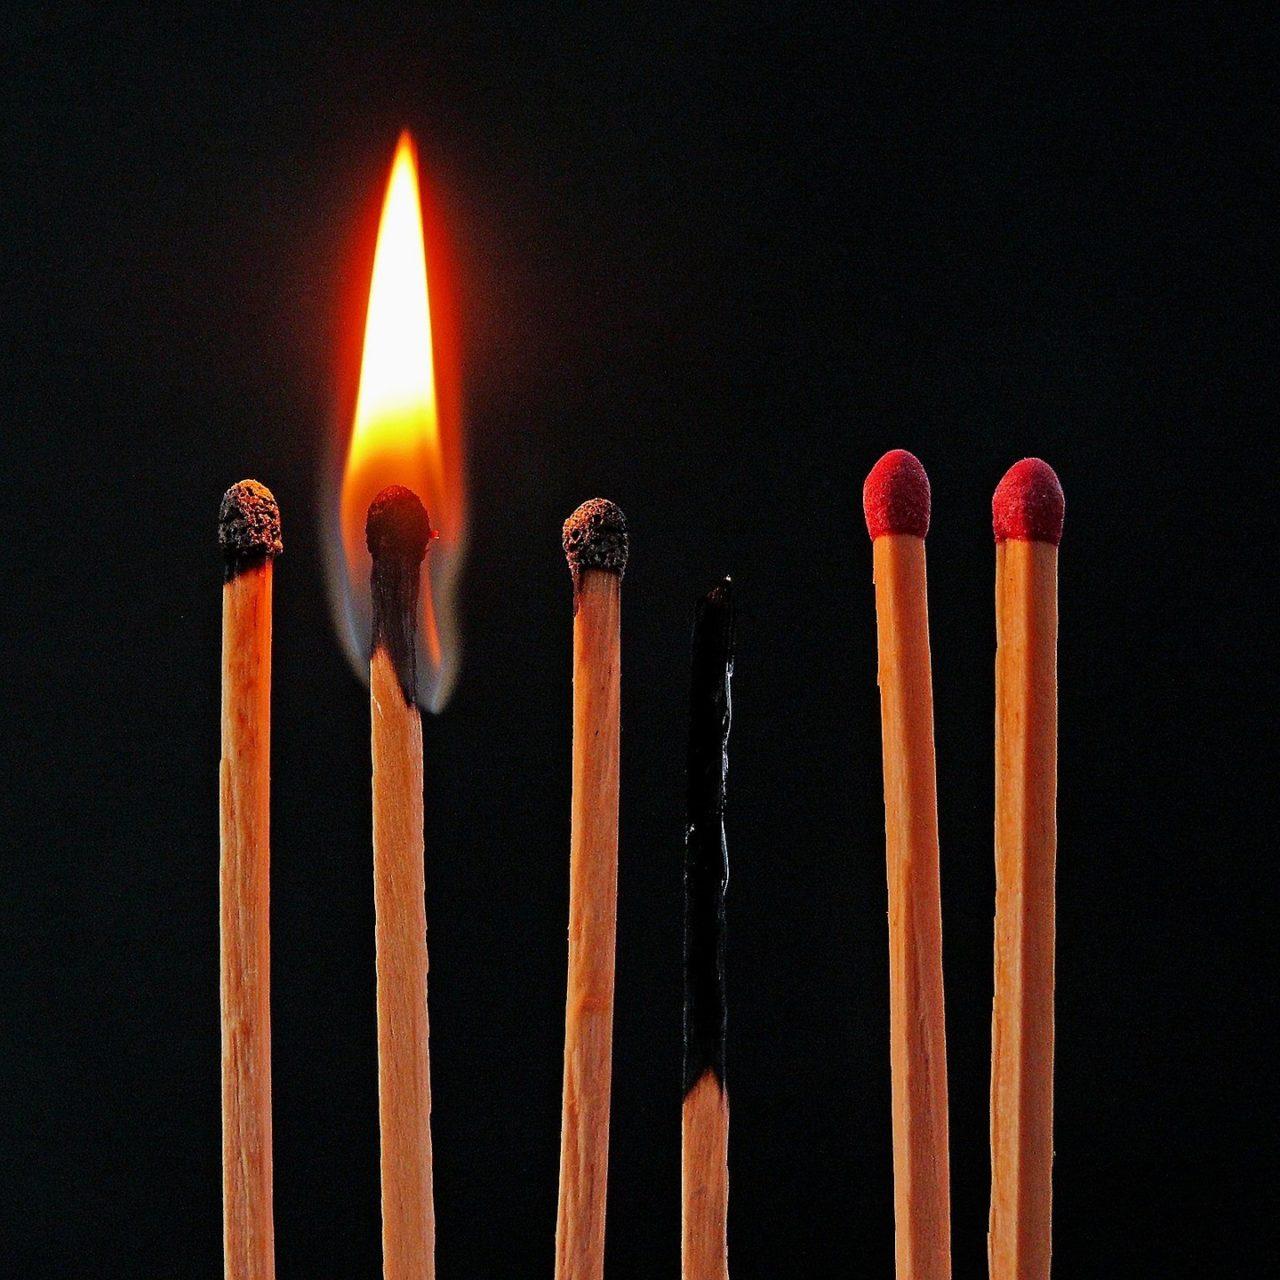 https://www.hladinaalfa.cz/wp-content/uploads/2019/11/burnout_s-1280x1280.jpg